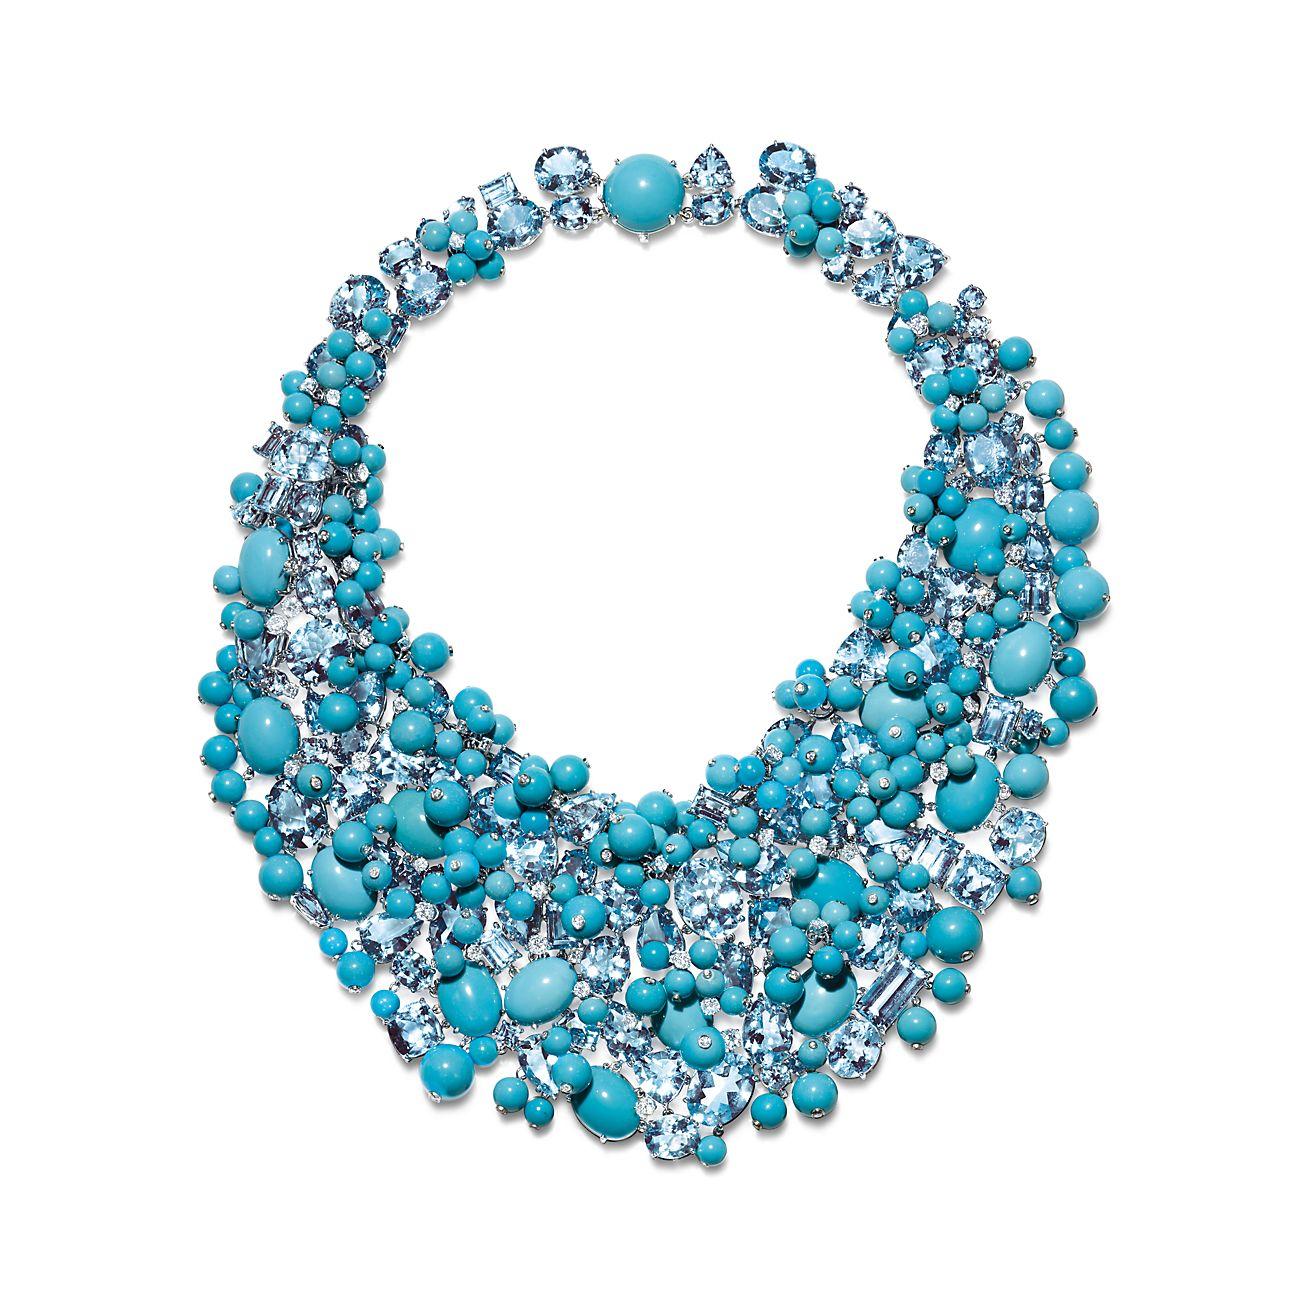 Tiffany Turquoise Necklace